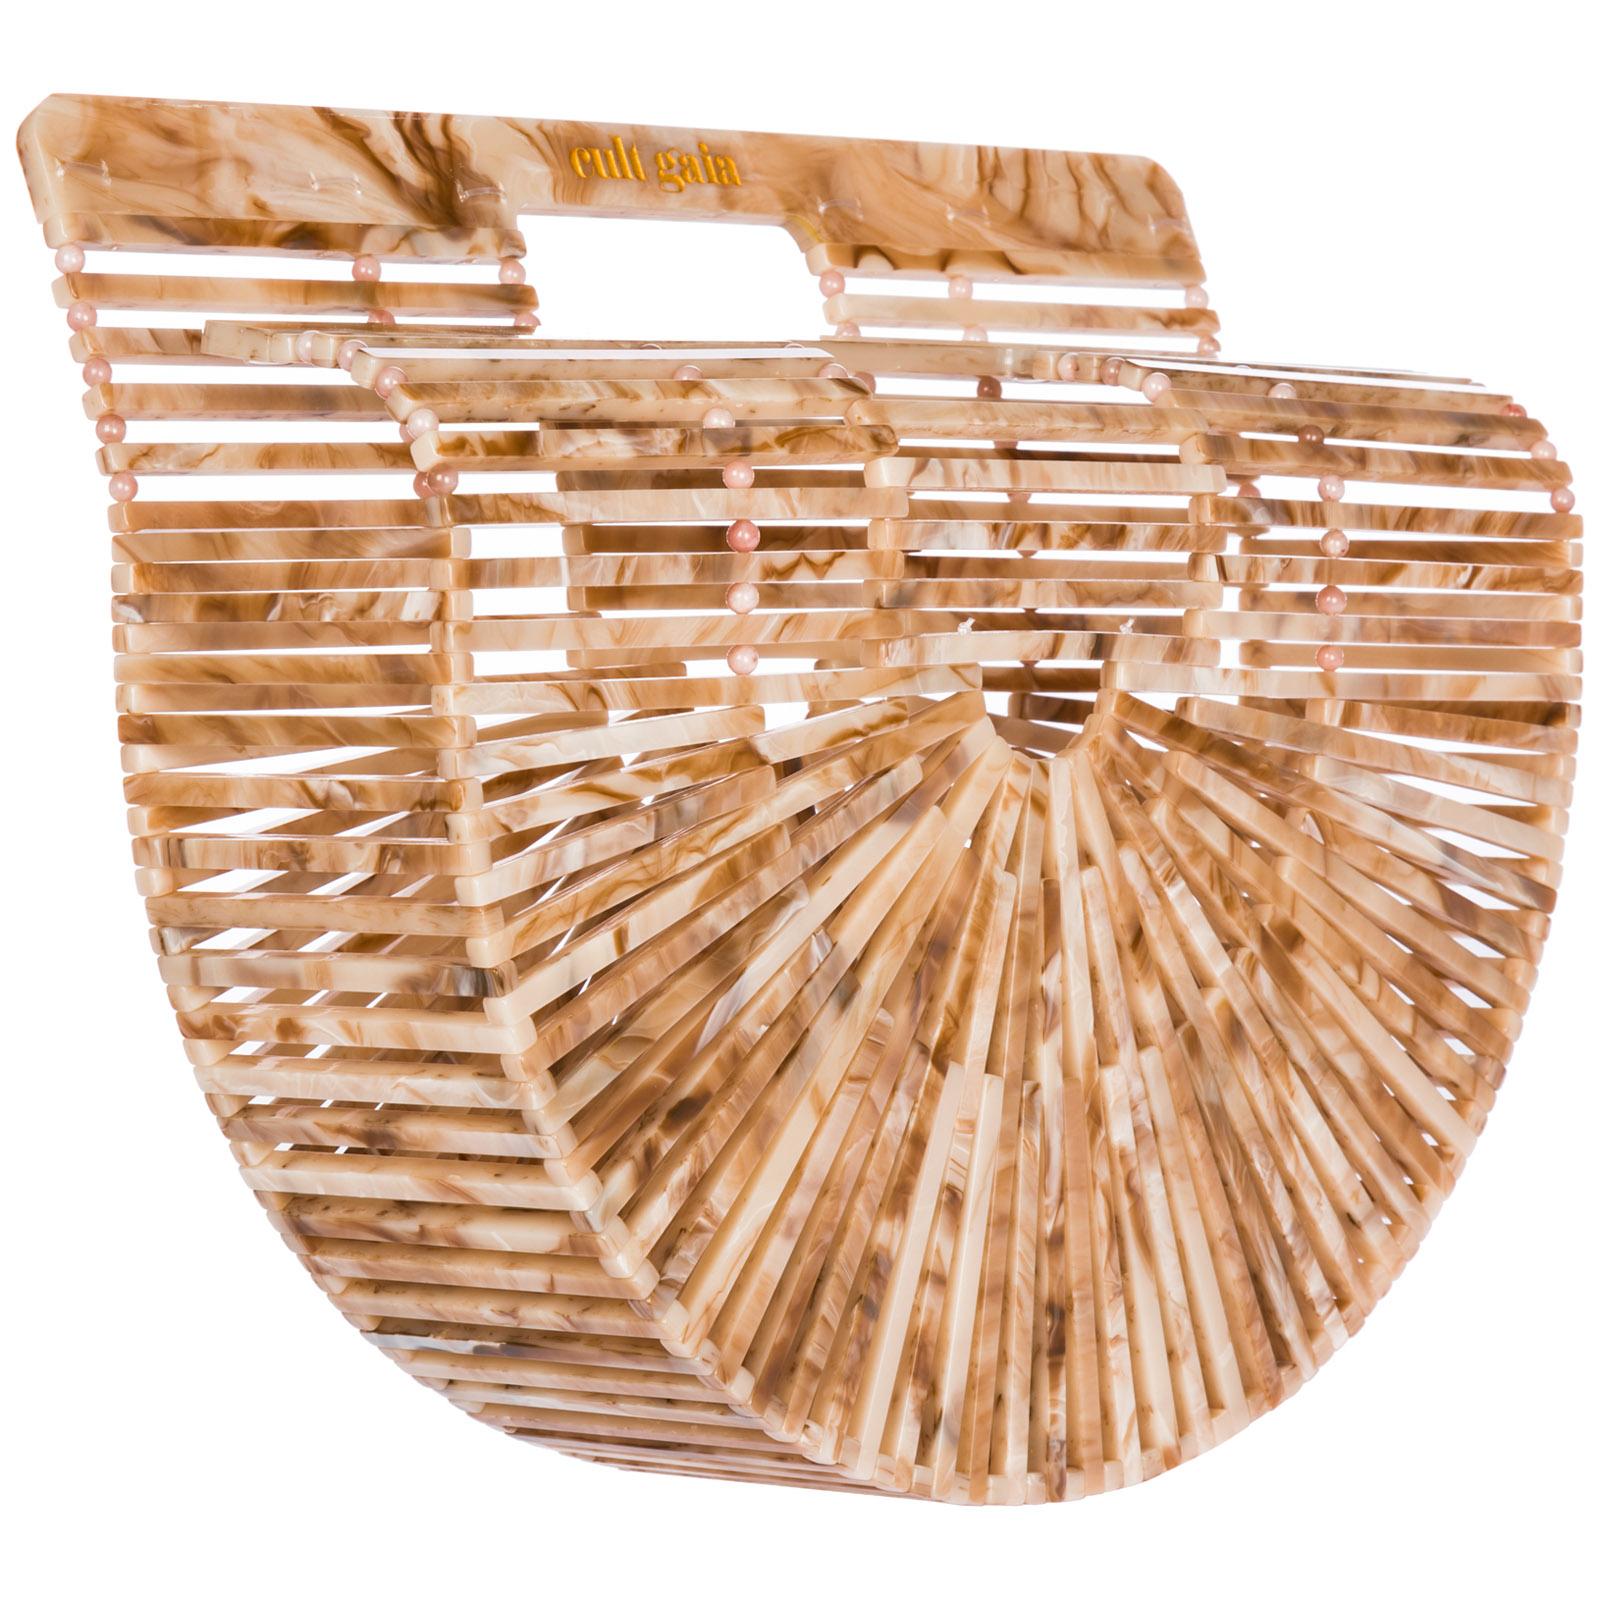 Women's handbag shopping bag purse